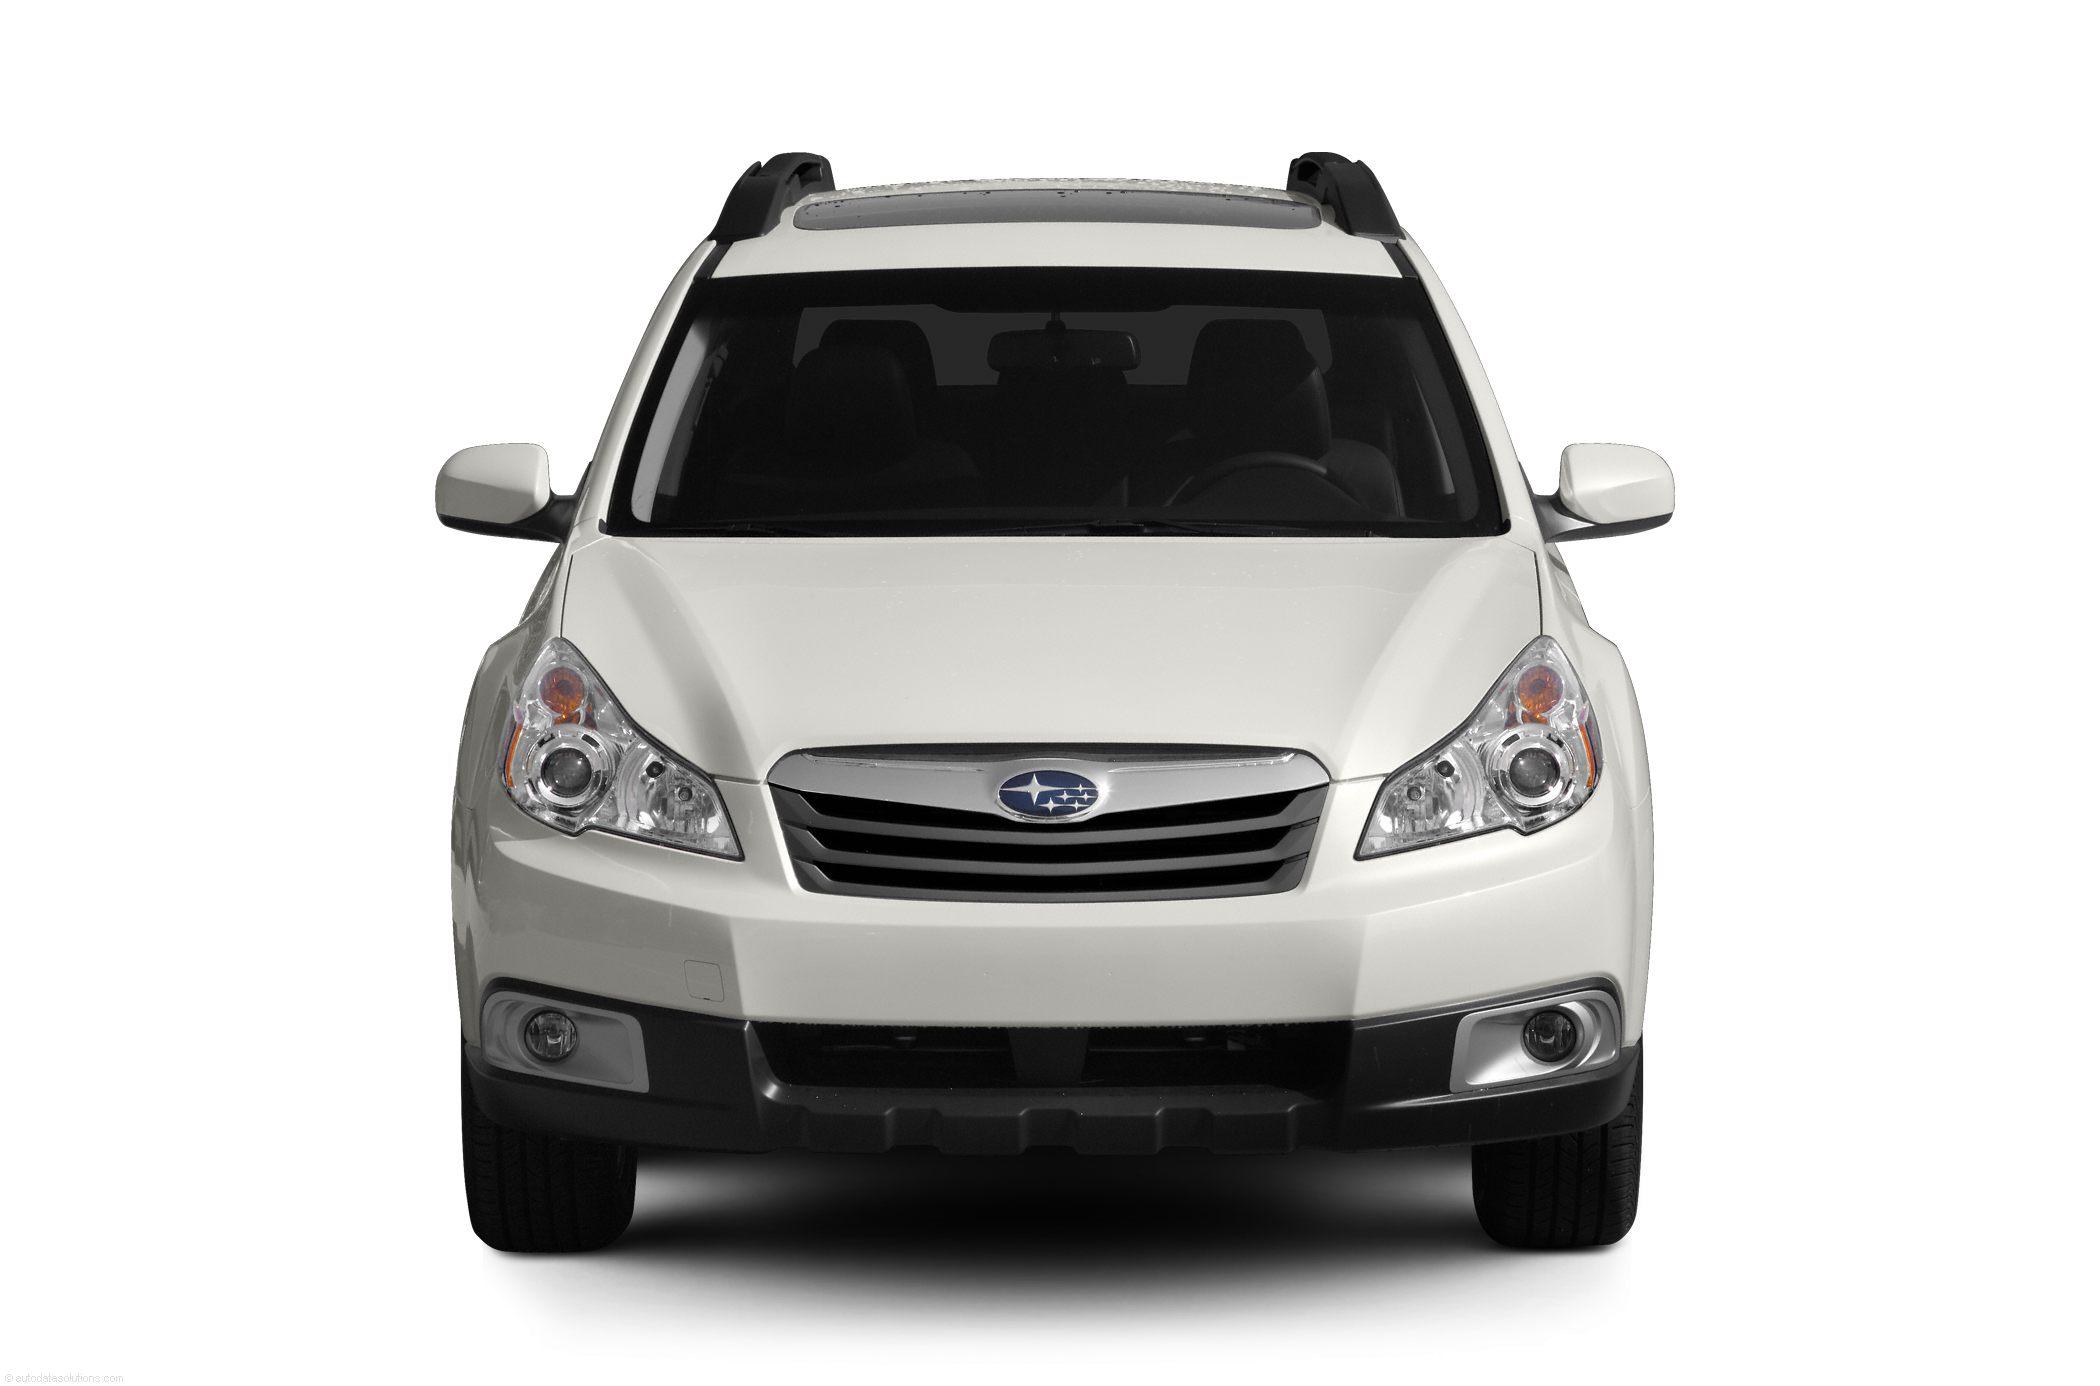 Subaru car front png #32709.